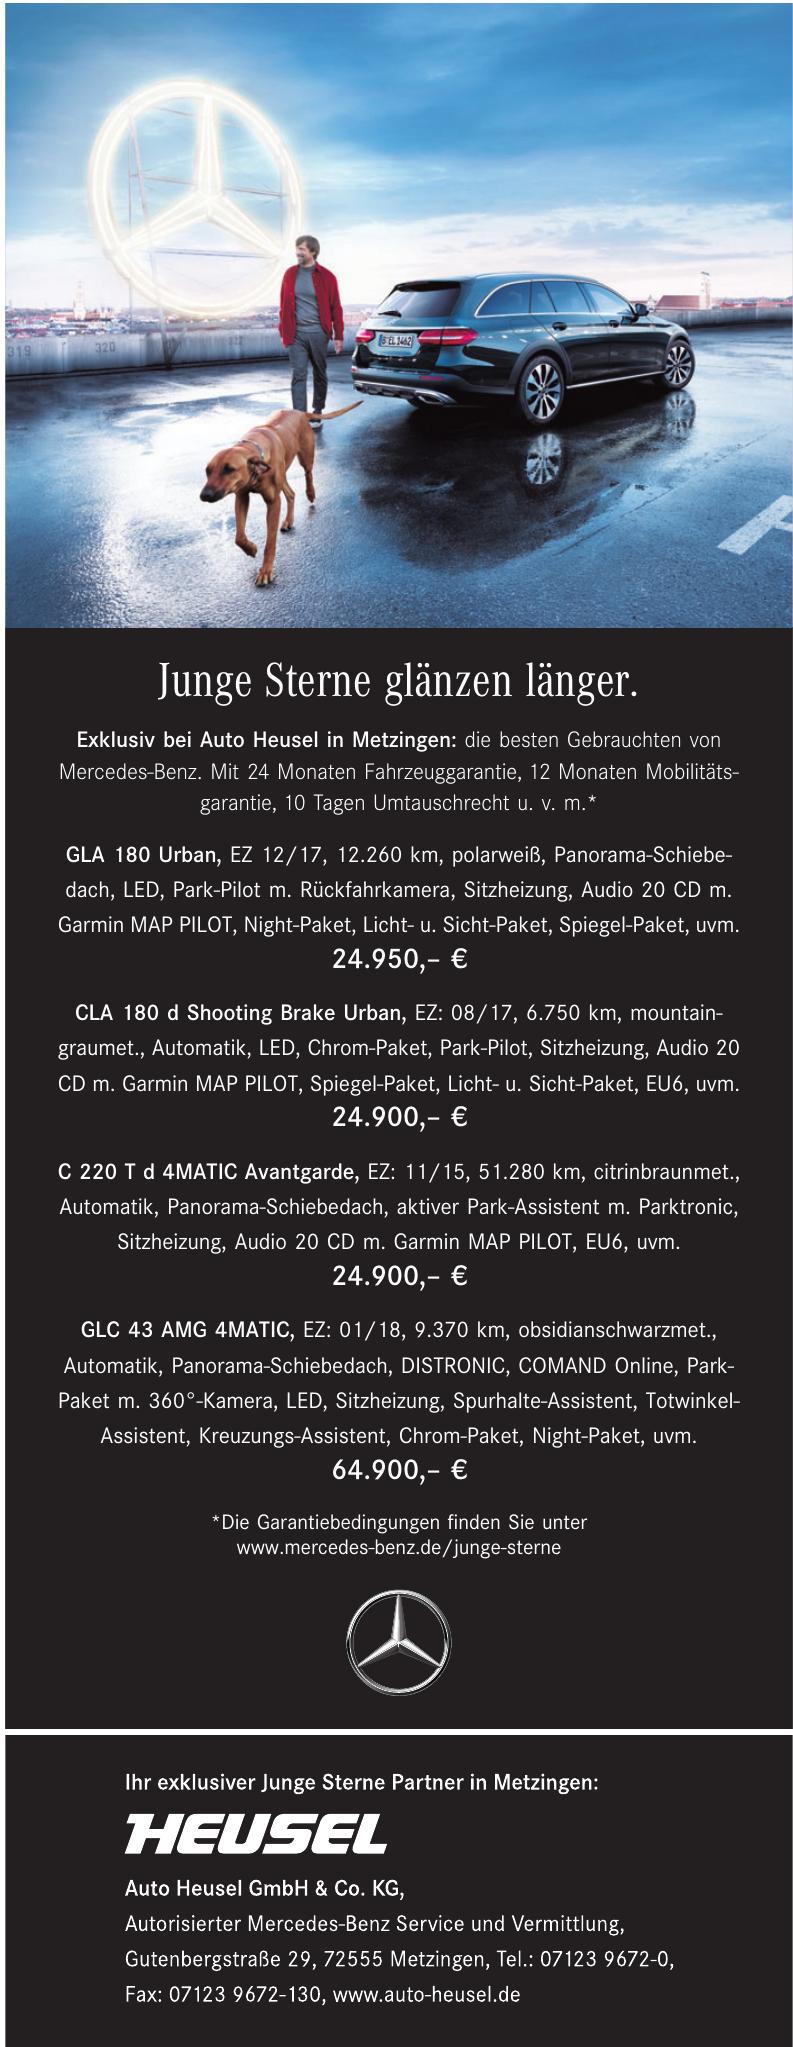 Auto Heusel GmbH & Co. KG